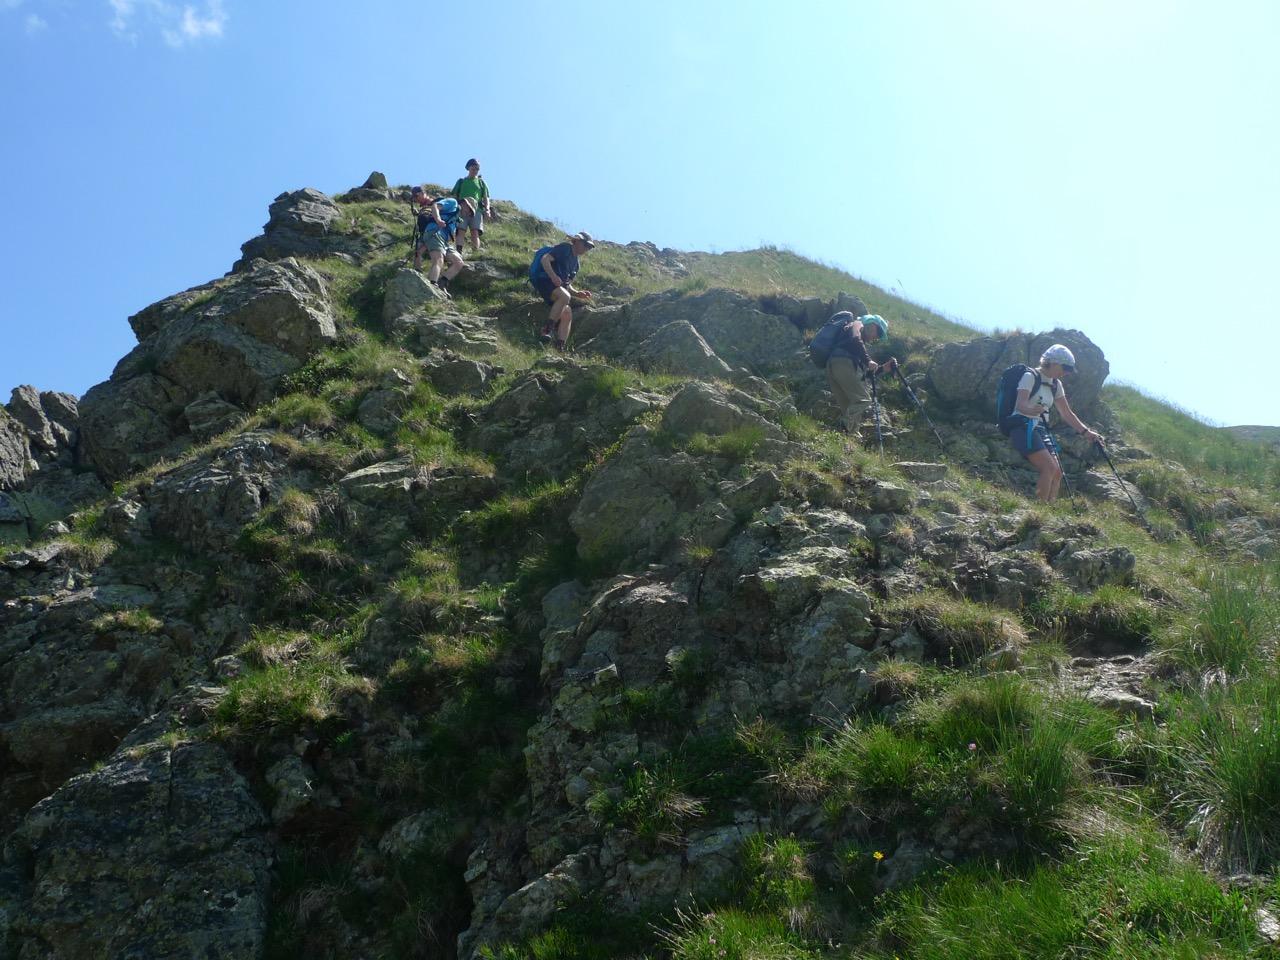 Kurze Kletterstelle am Grat